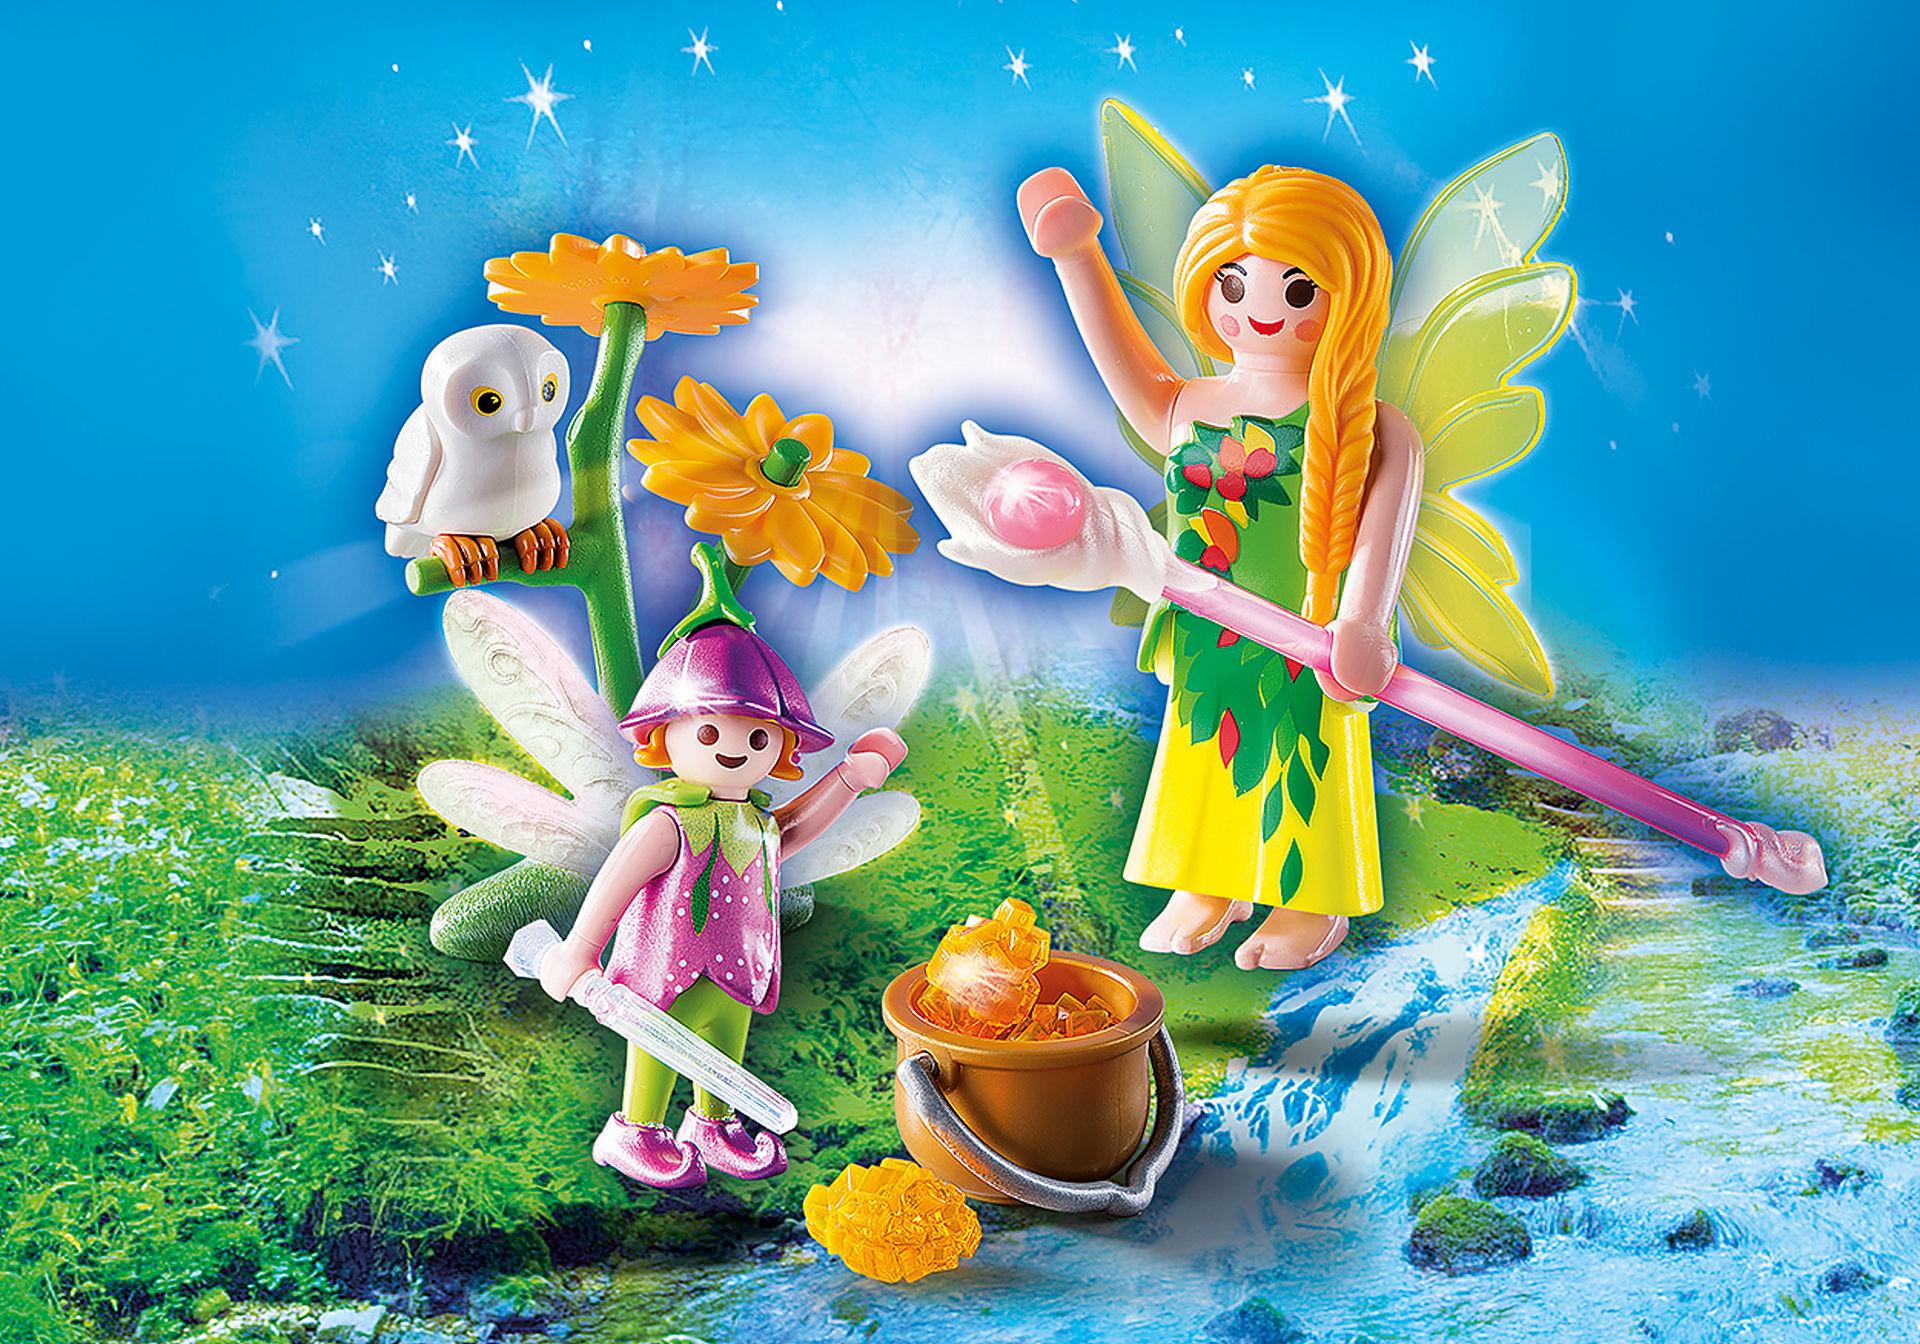 http://media.playmobil.com/i/playmobil/9208_product_detail/Hada con Varita Mágica y Flor